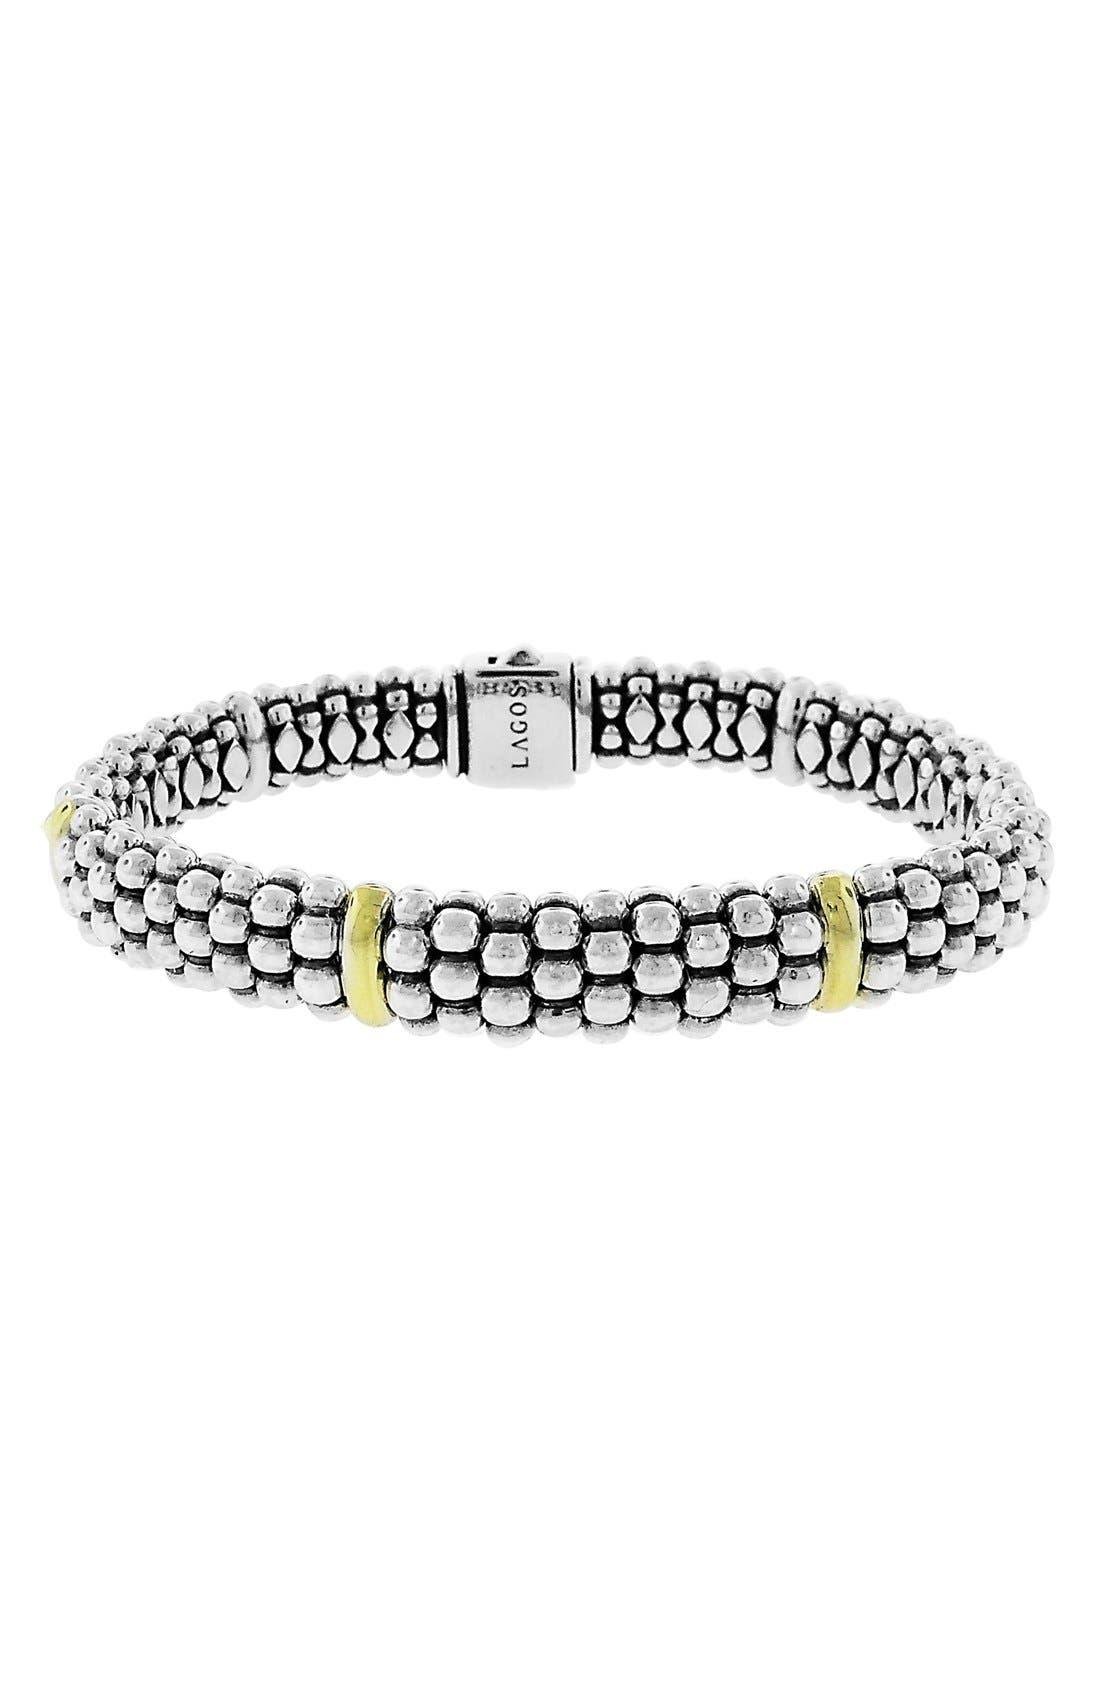 Caviar Rope Bracelet,                             Main thumbnail 1, color,                             SILVER/ GOLD